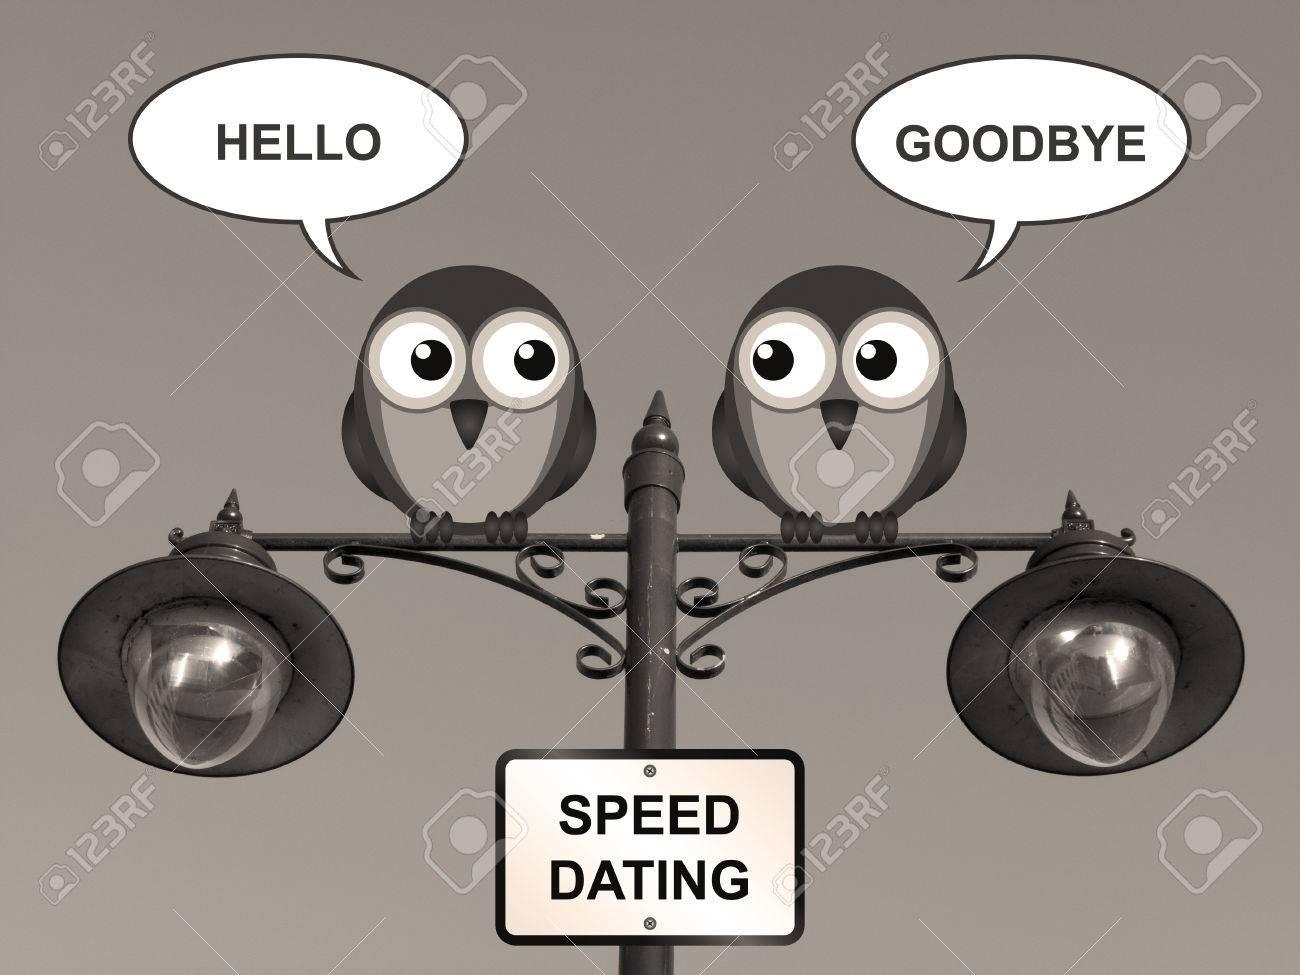 Hello speed dating